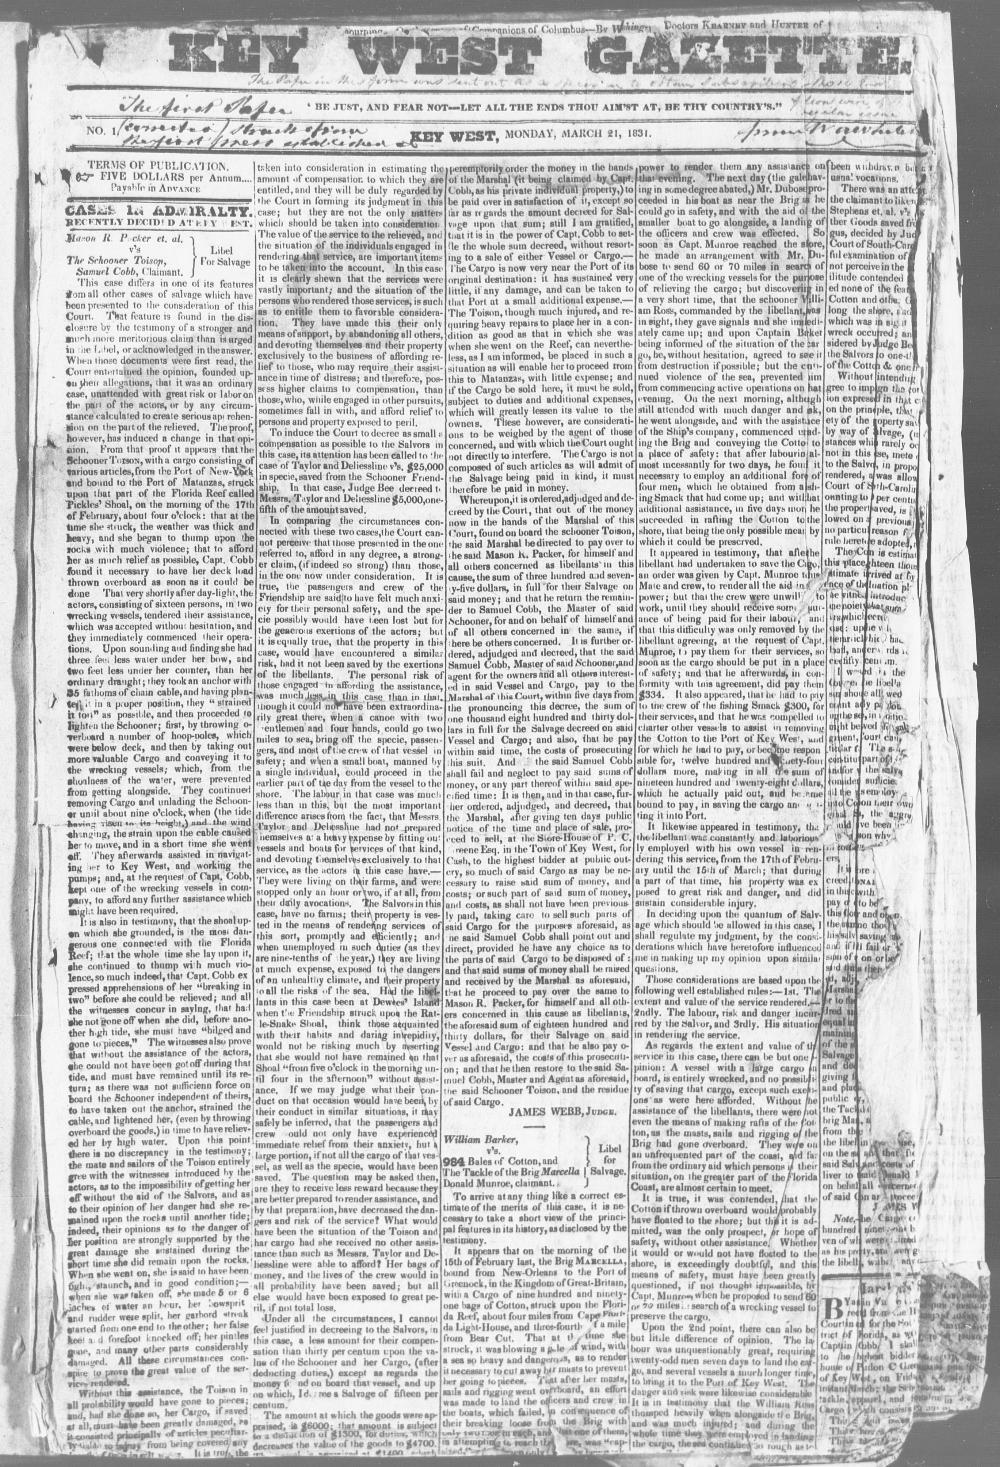 Key West gazette - Page 1